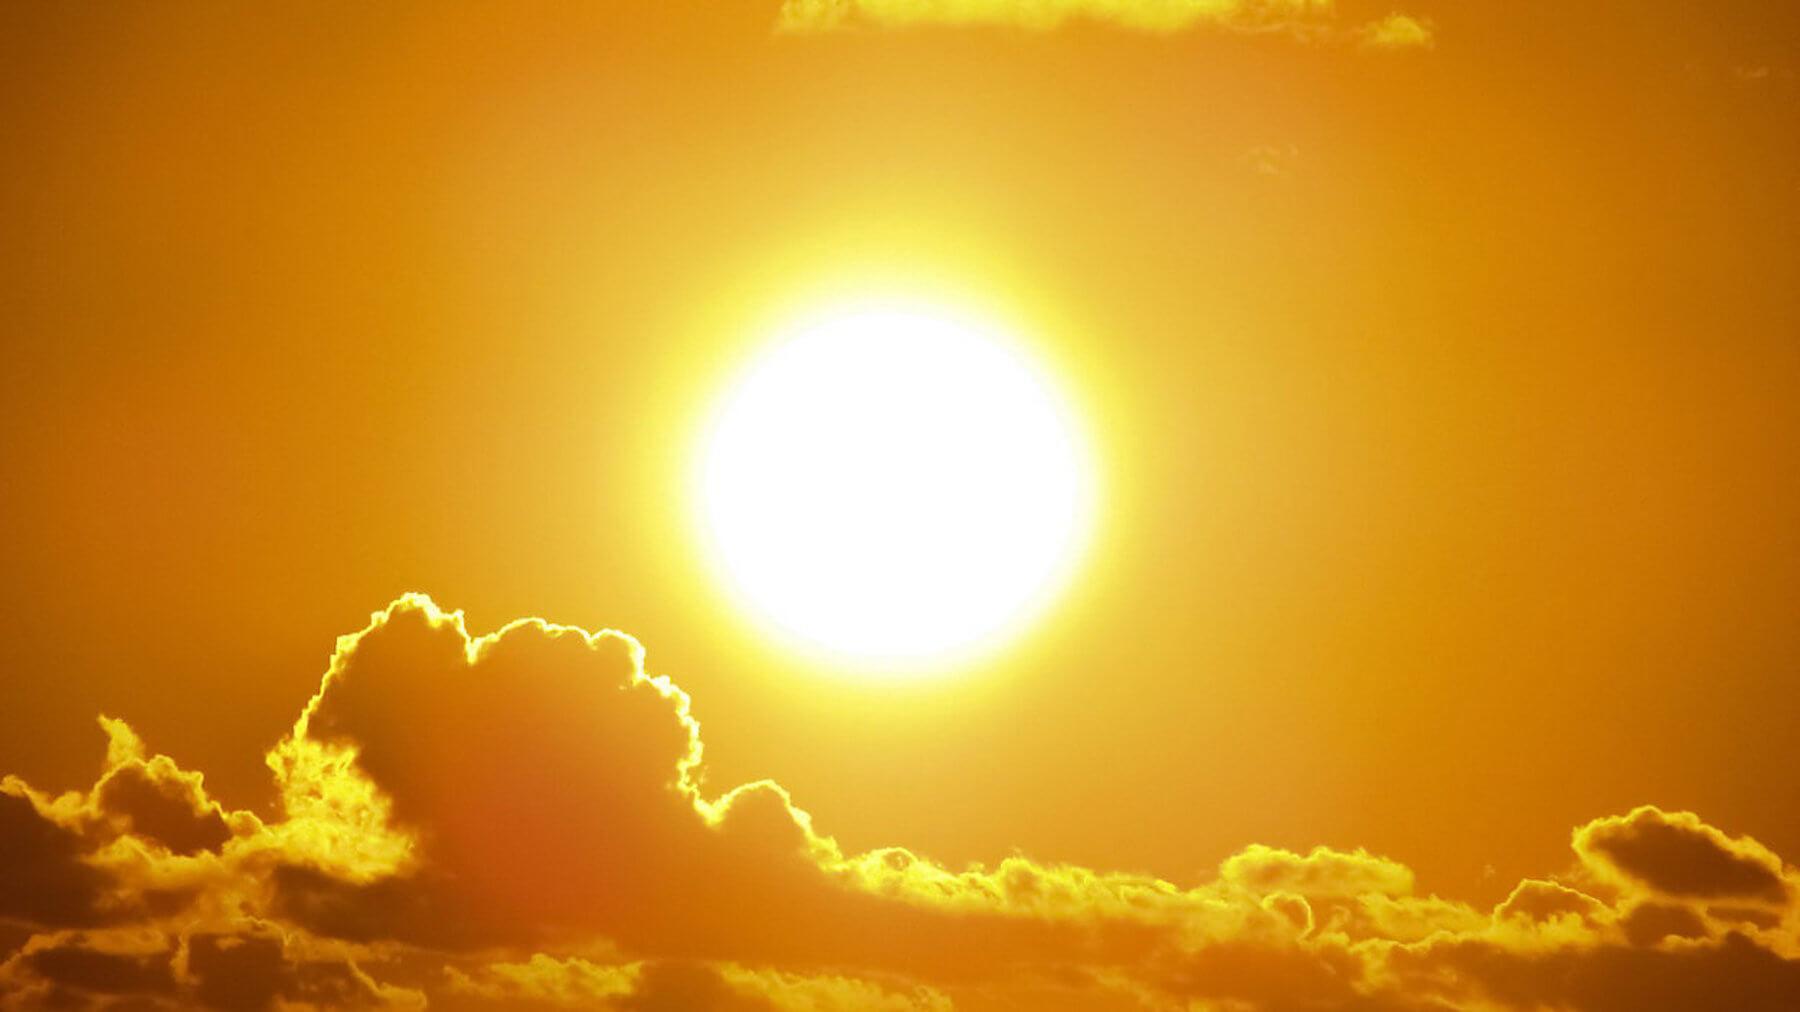 Bright orange sun reflecting on clouds below